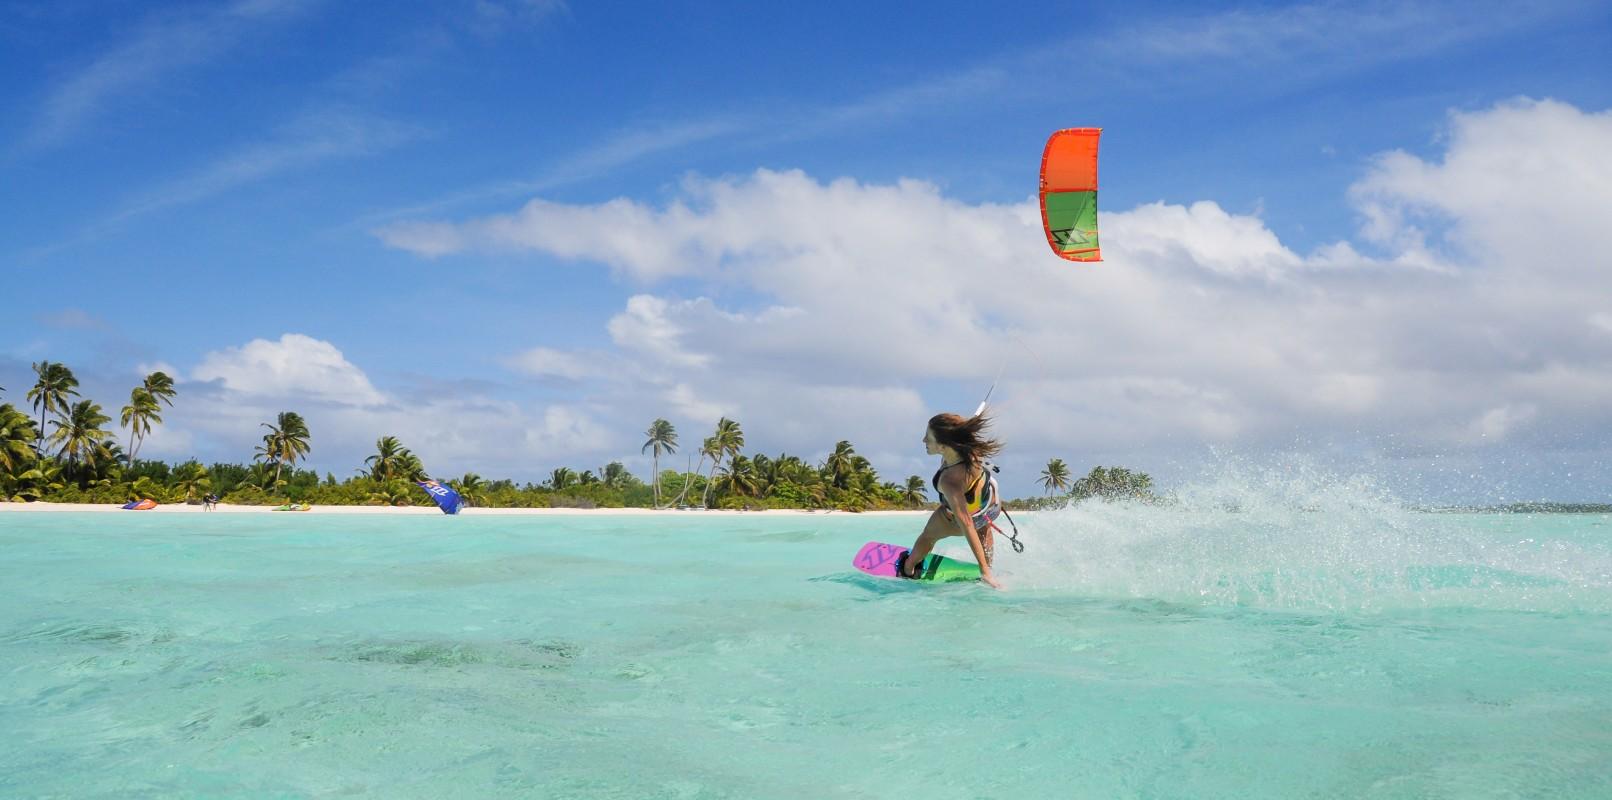 Girl kitesurfing in Cocos Islands from Kiteworld magazine